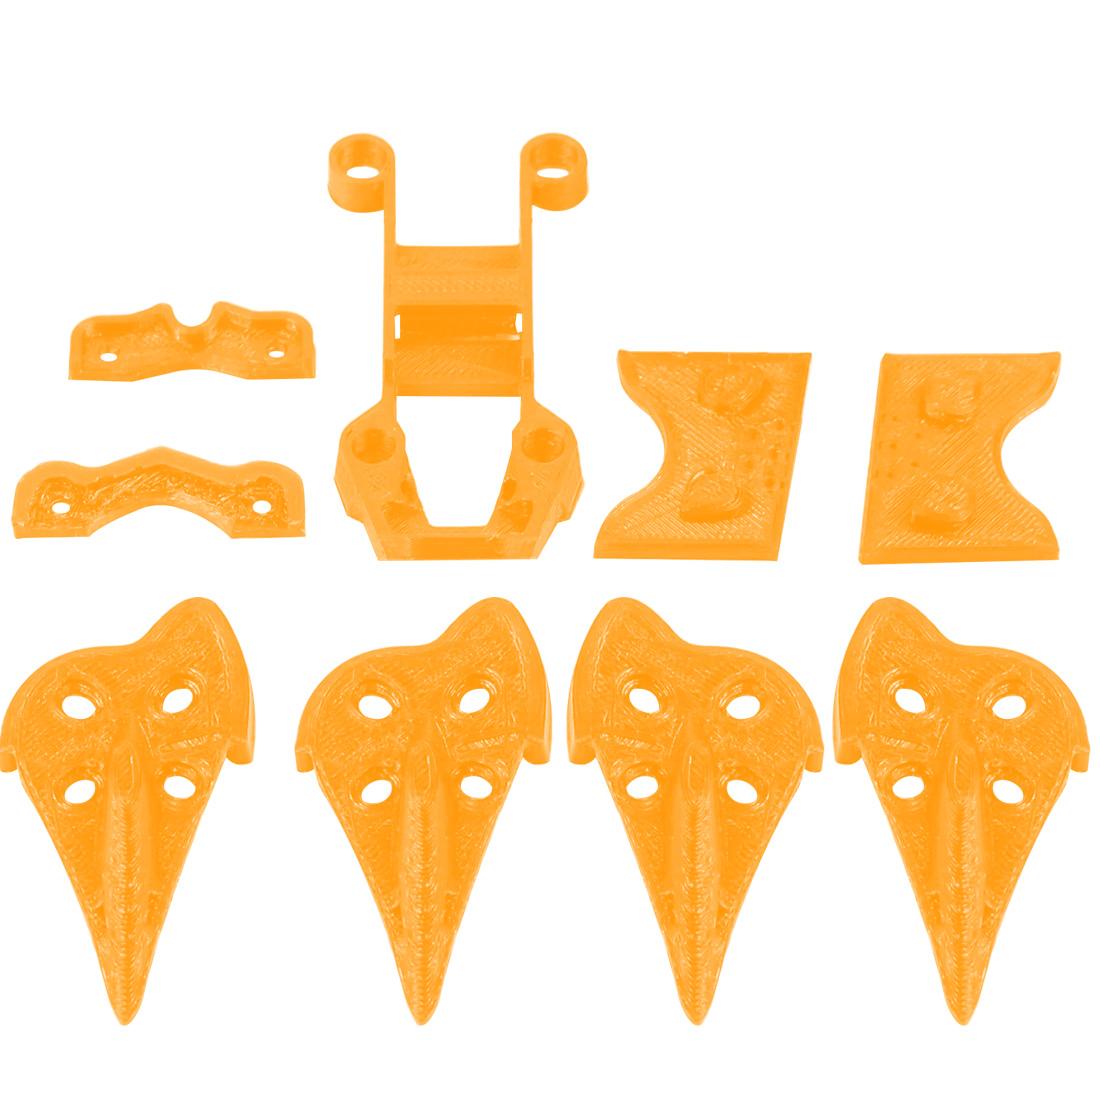 4pcs//Set JMT TPU Landing Skid 3D Printed Landing Gear for FPV Racing Drone